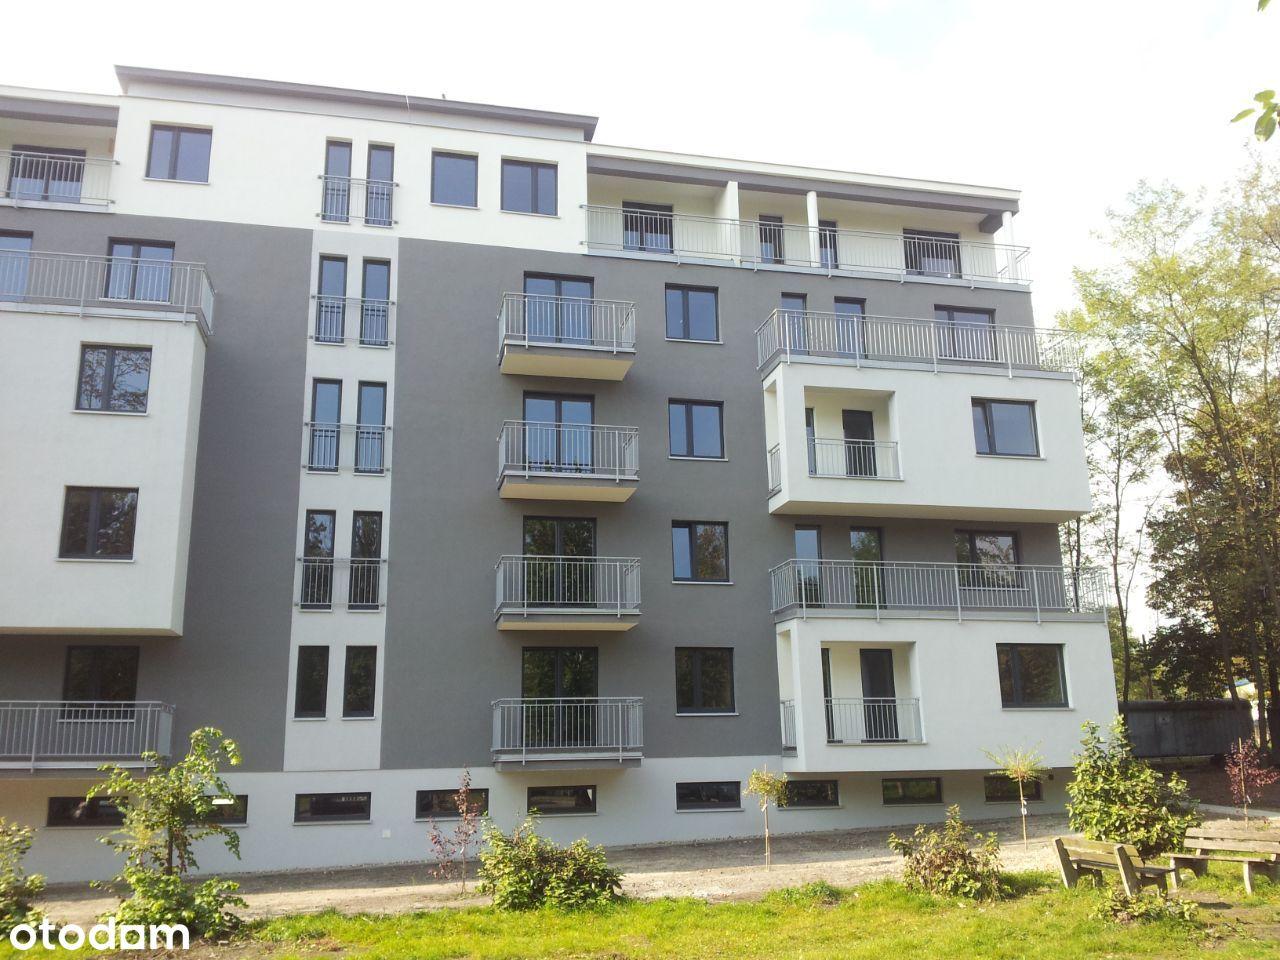 Apartament Premium | Wysoki Standard | Duży Balkon